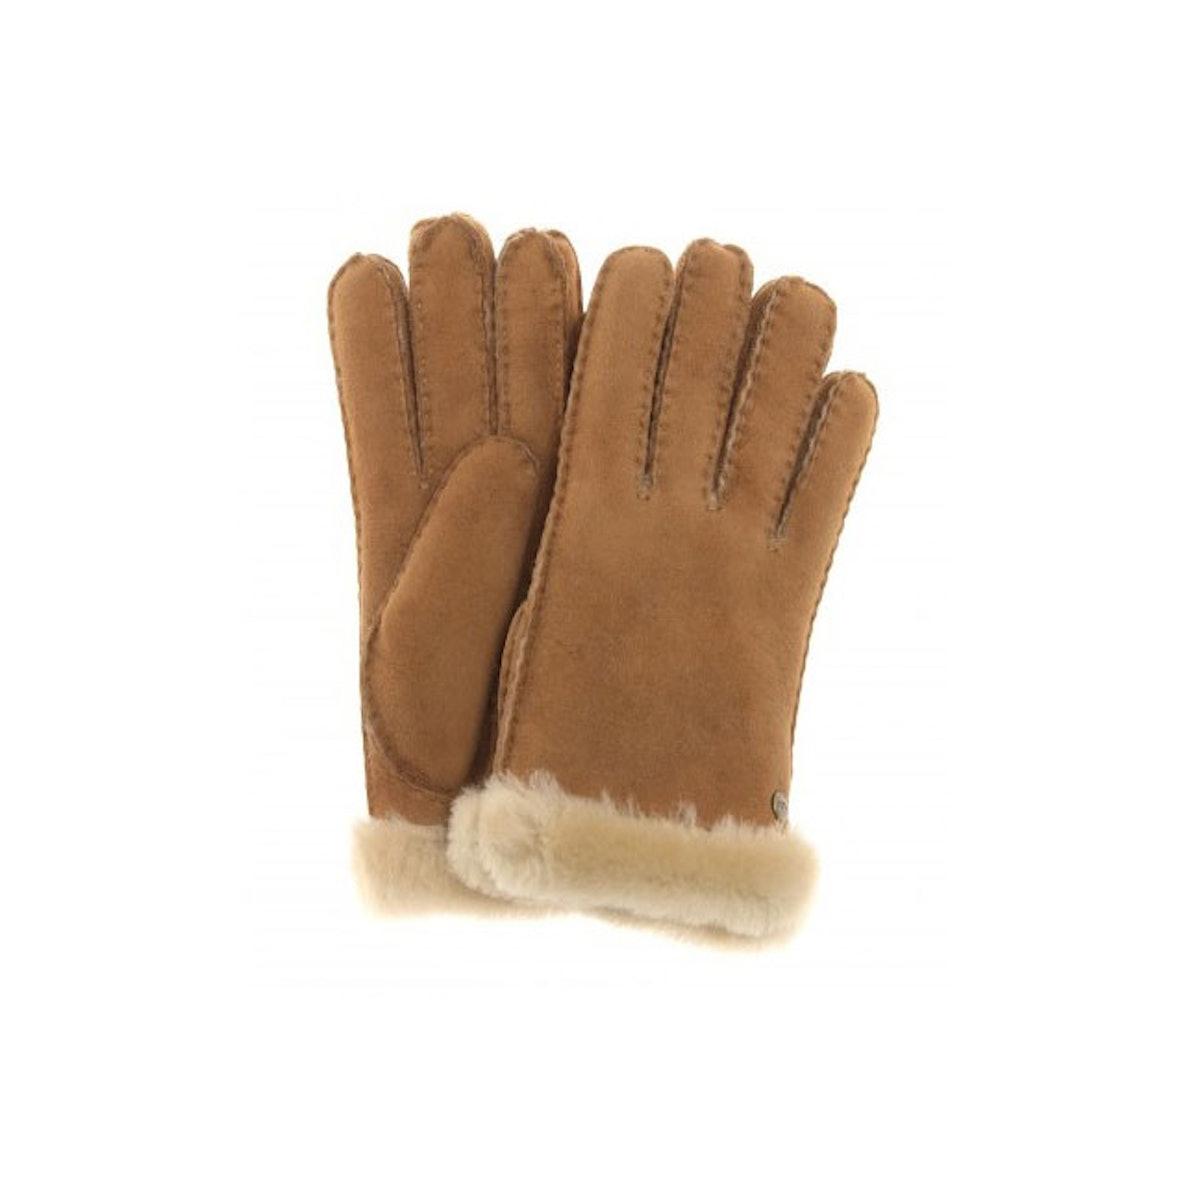 Ugg shearling gloves